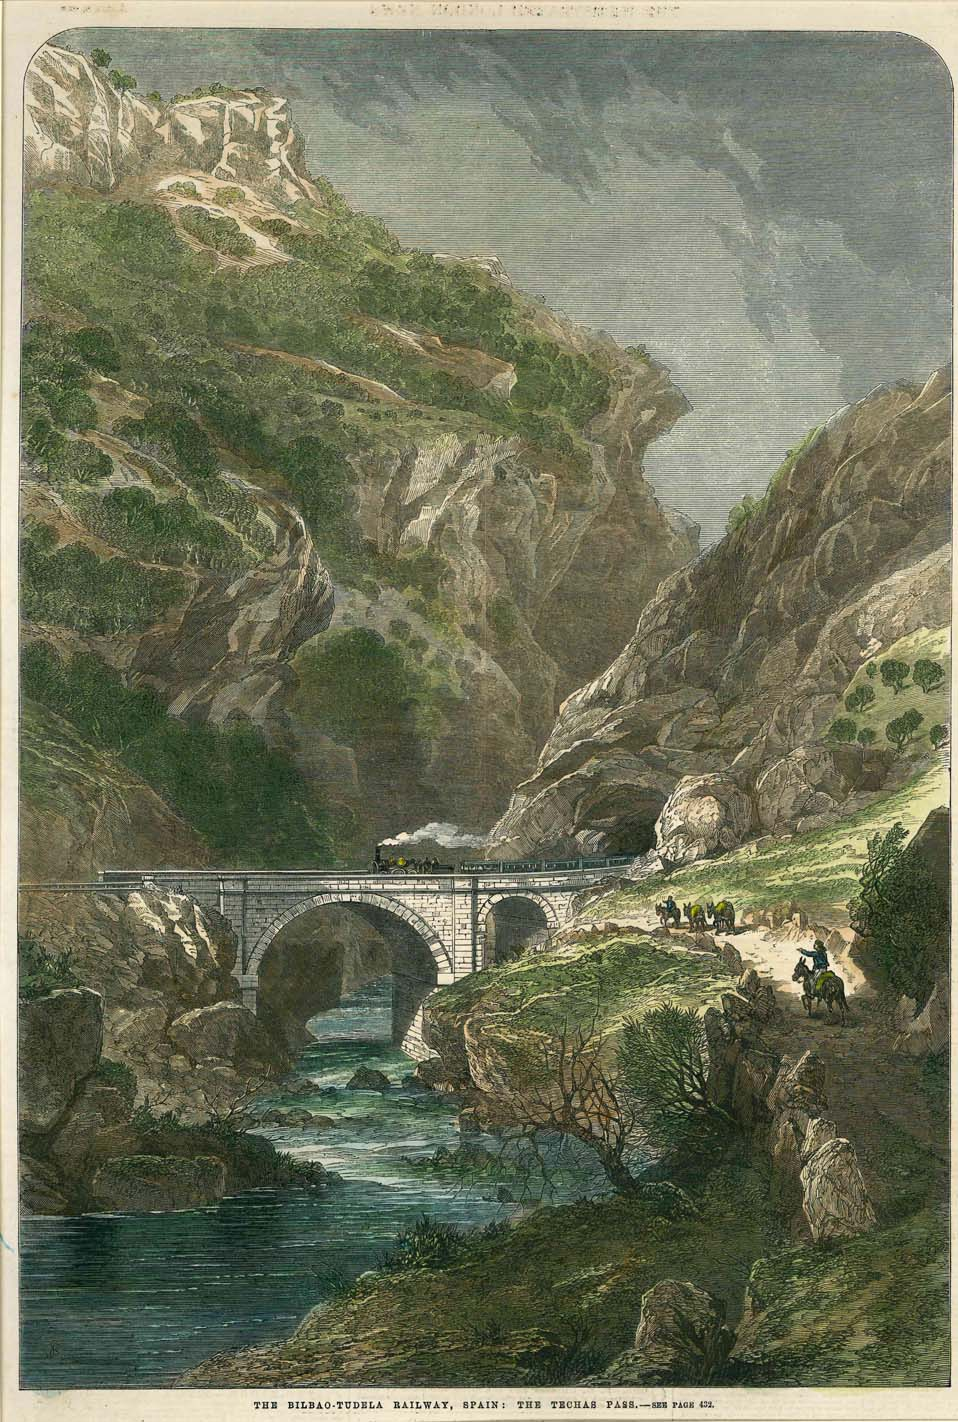 The Bilbao-Tudela Railway